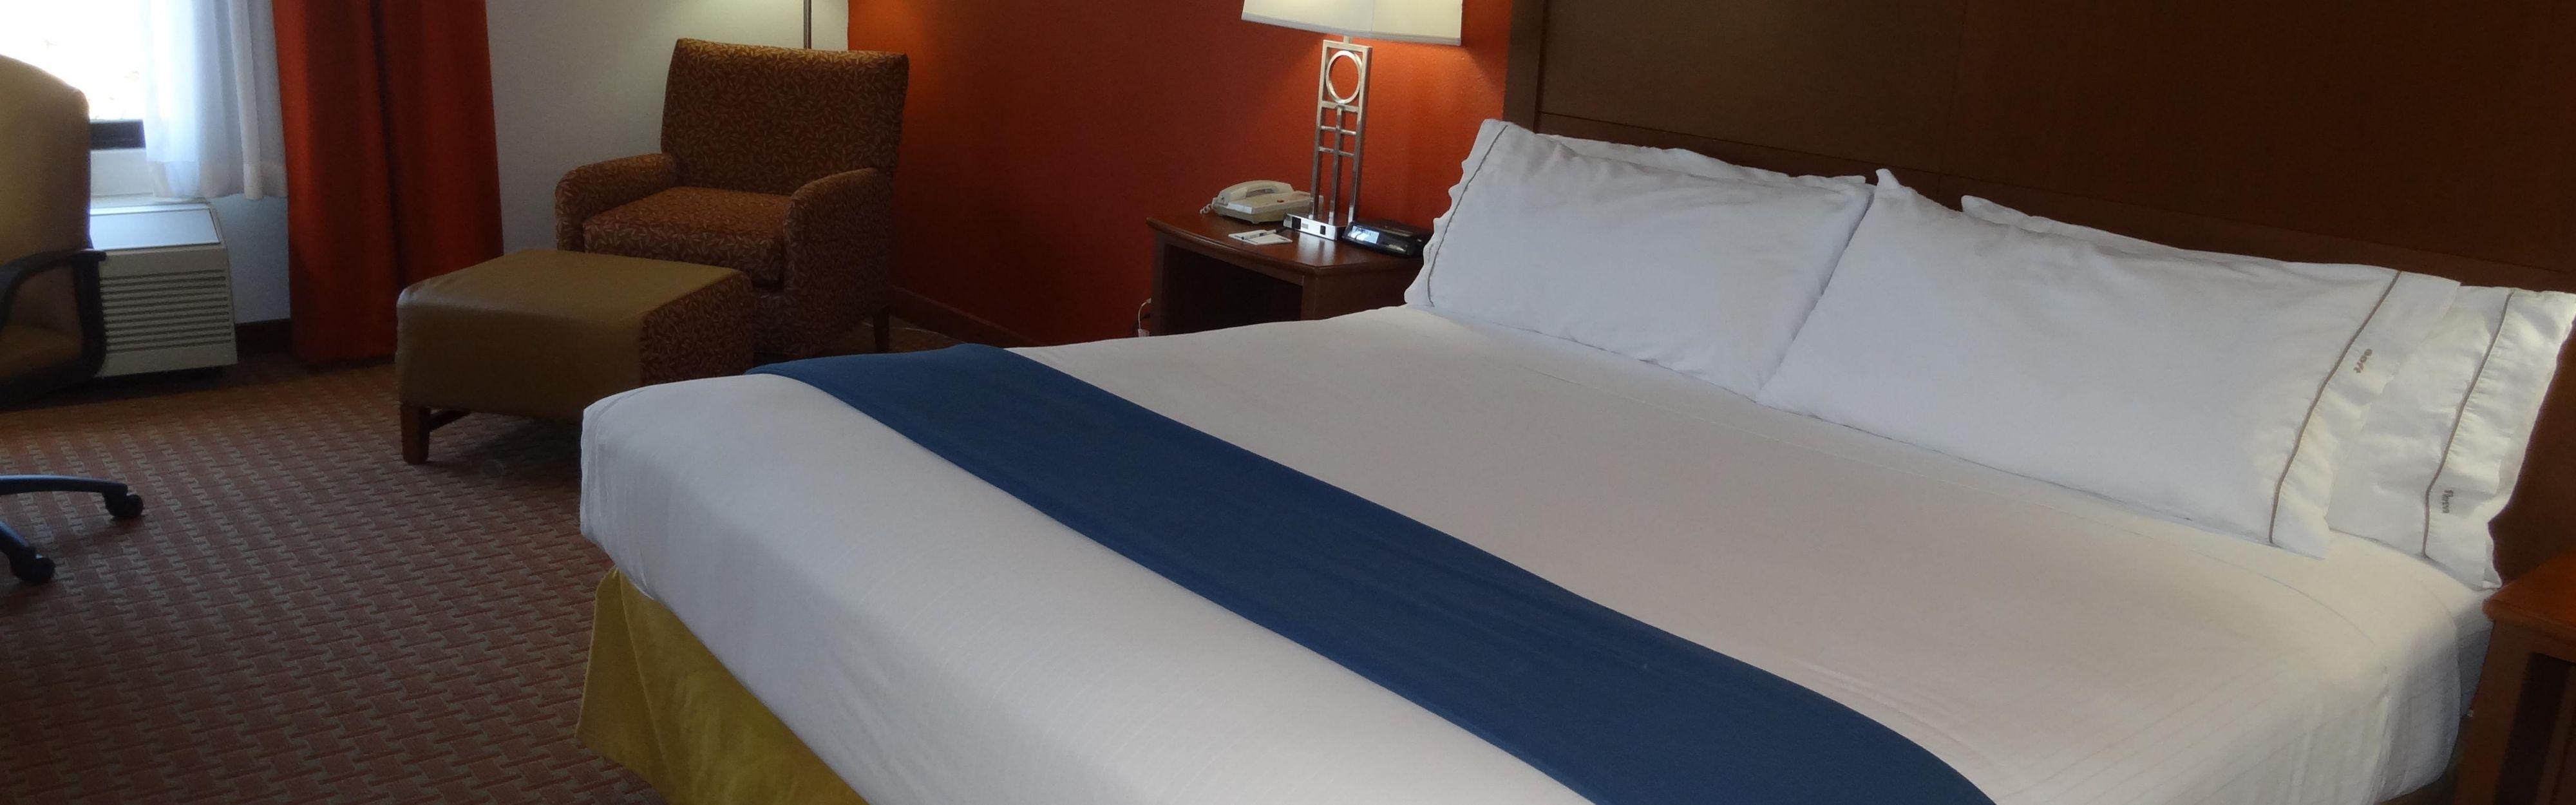 Holiday Inn Express Clayton (Se Raleigh) image 1